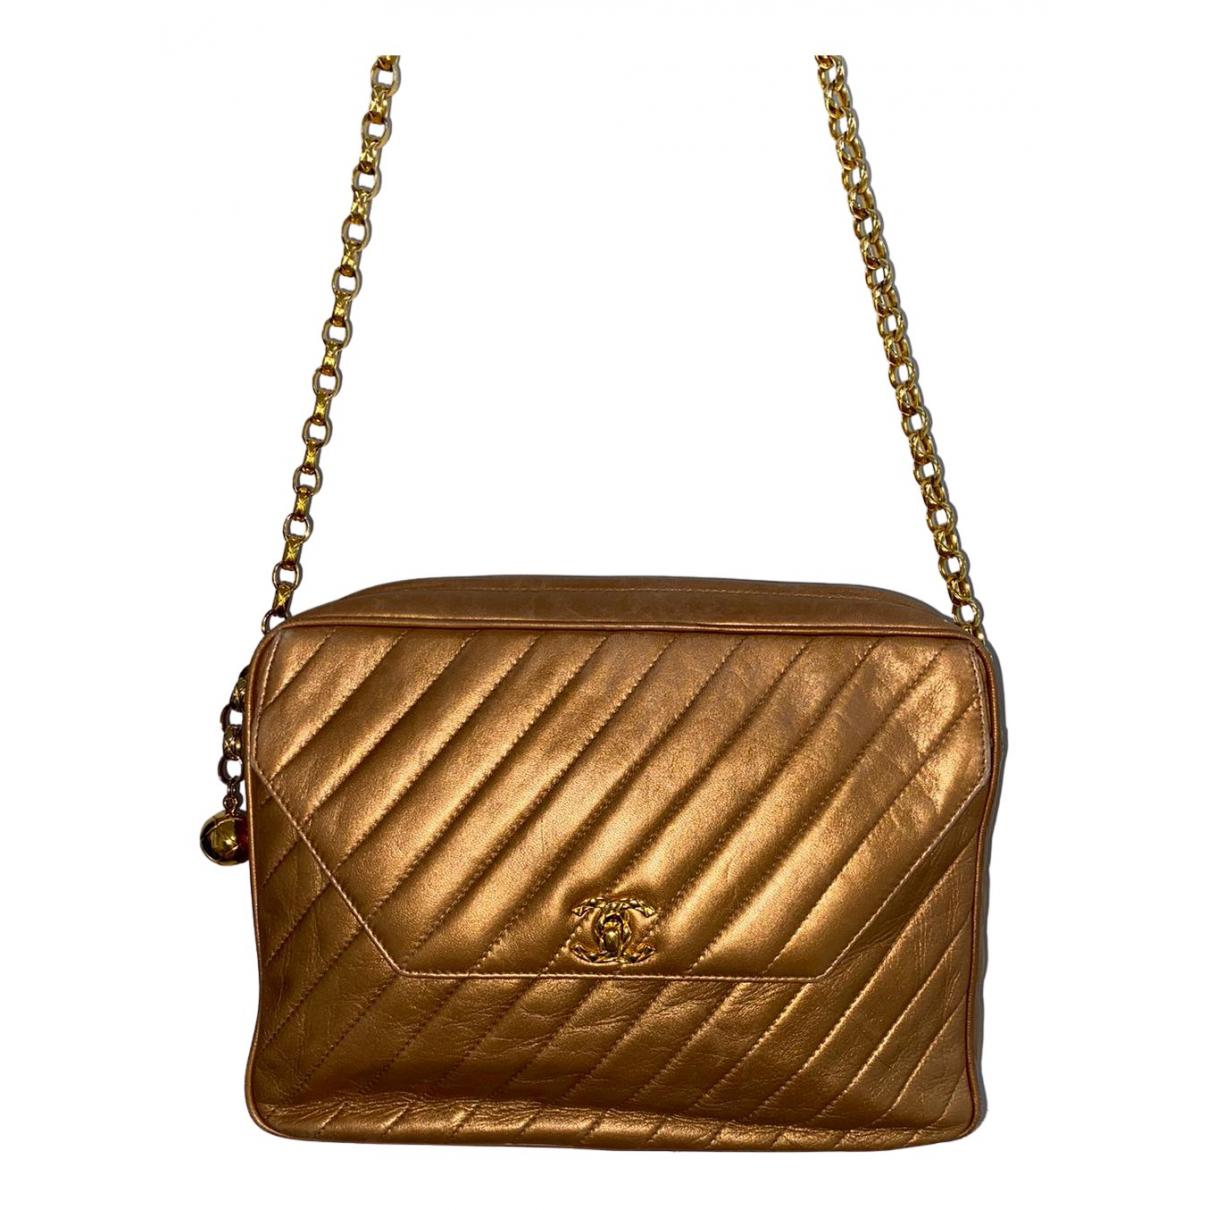 Chanel \N Gold Leather handbag for Women \N